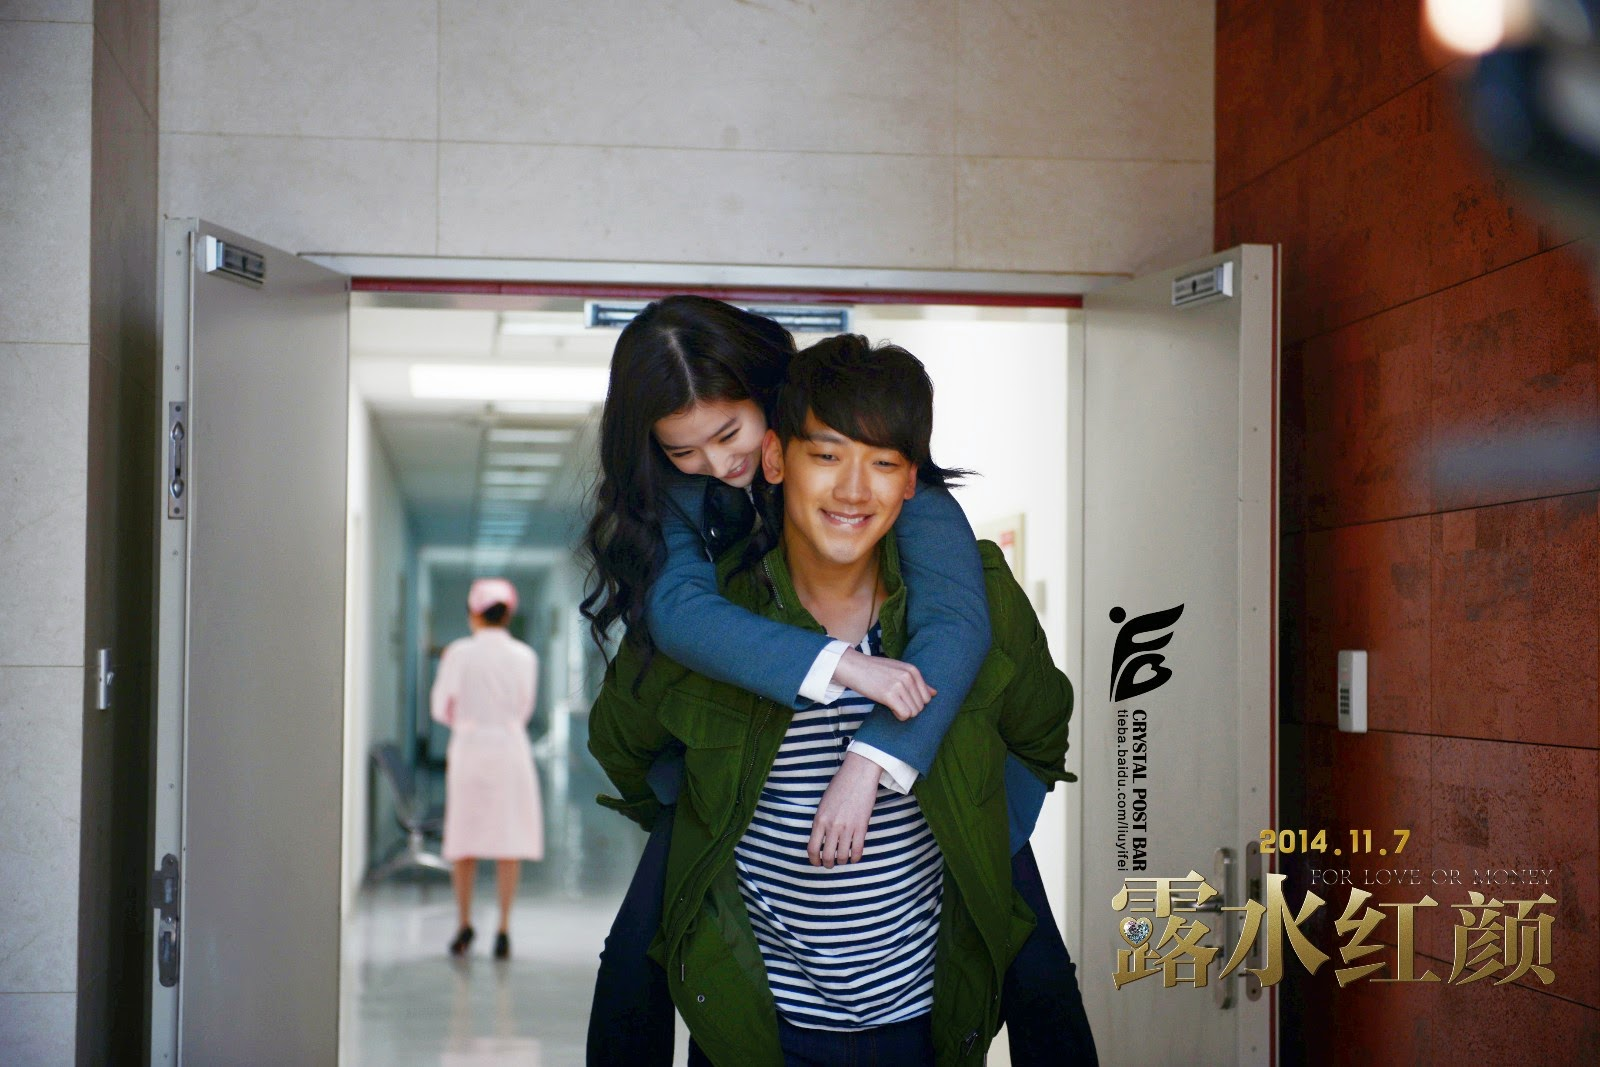 Rain 中国映画 露水紅顔_c0047605_8102081.jpg